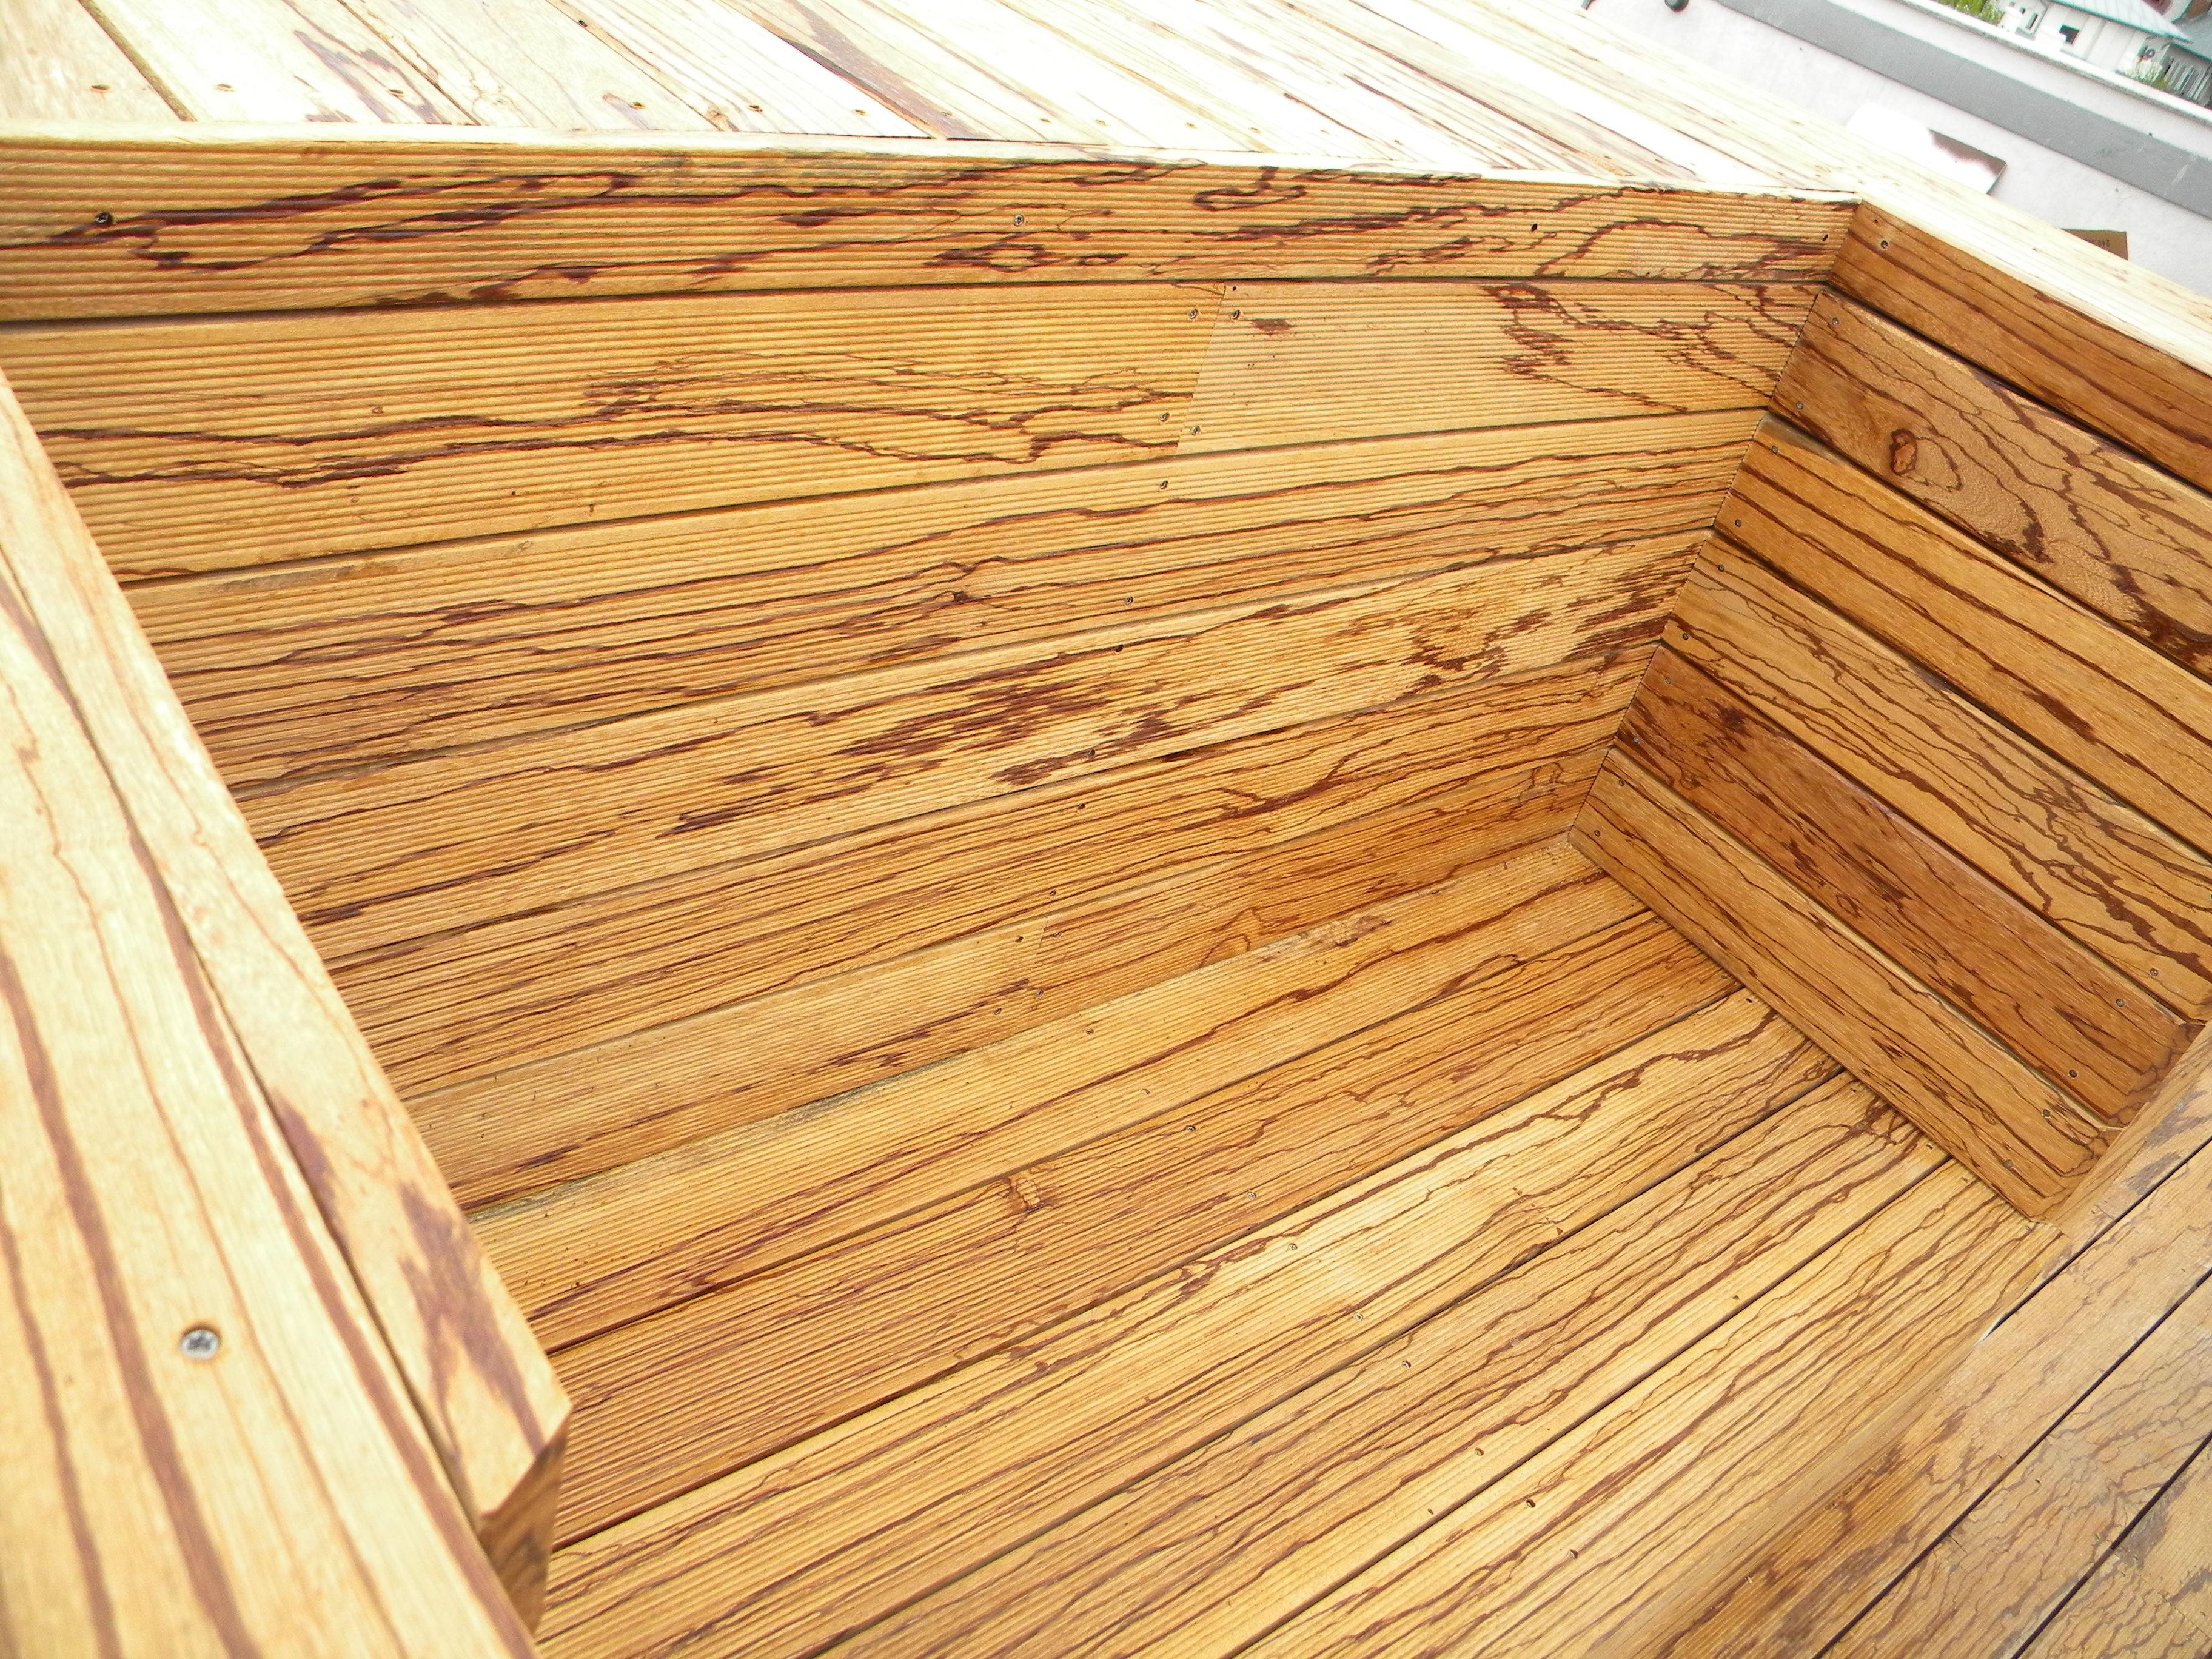 Deck-uri lemn - Angelim Rajado SELVA FLOORS - Poza 33